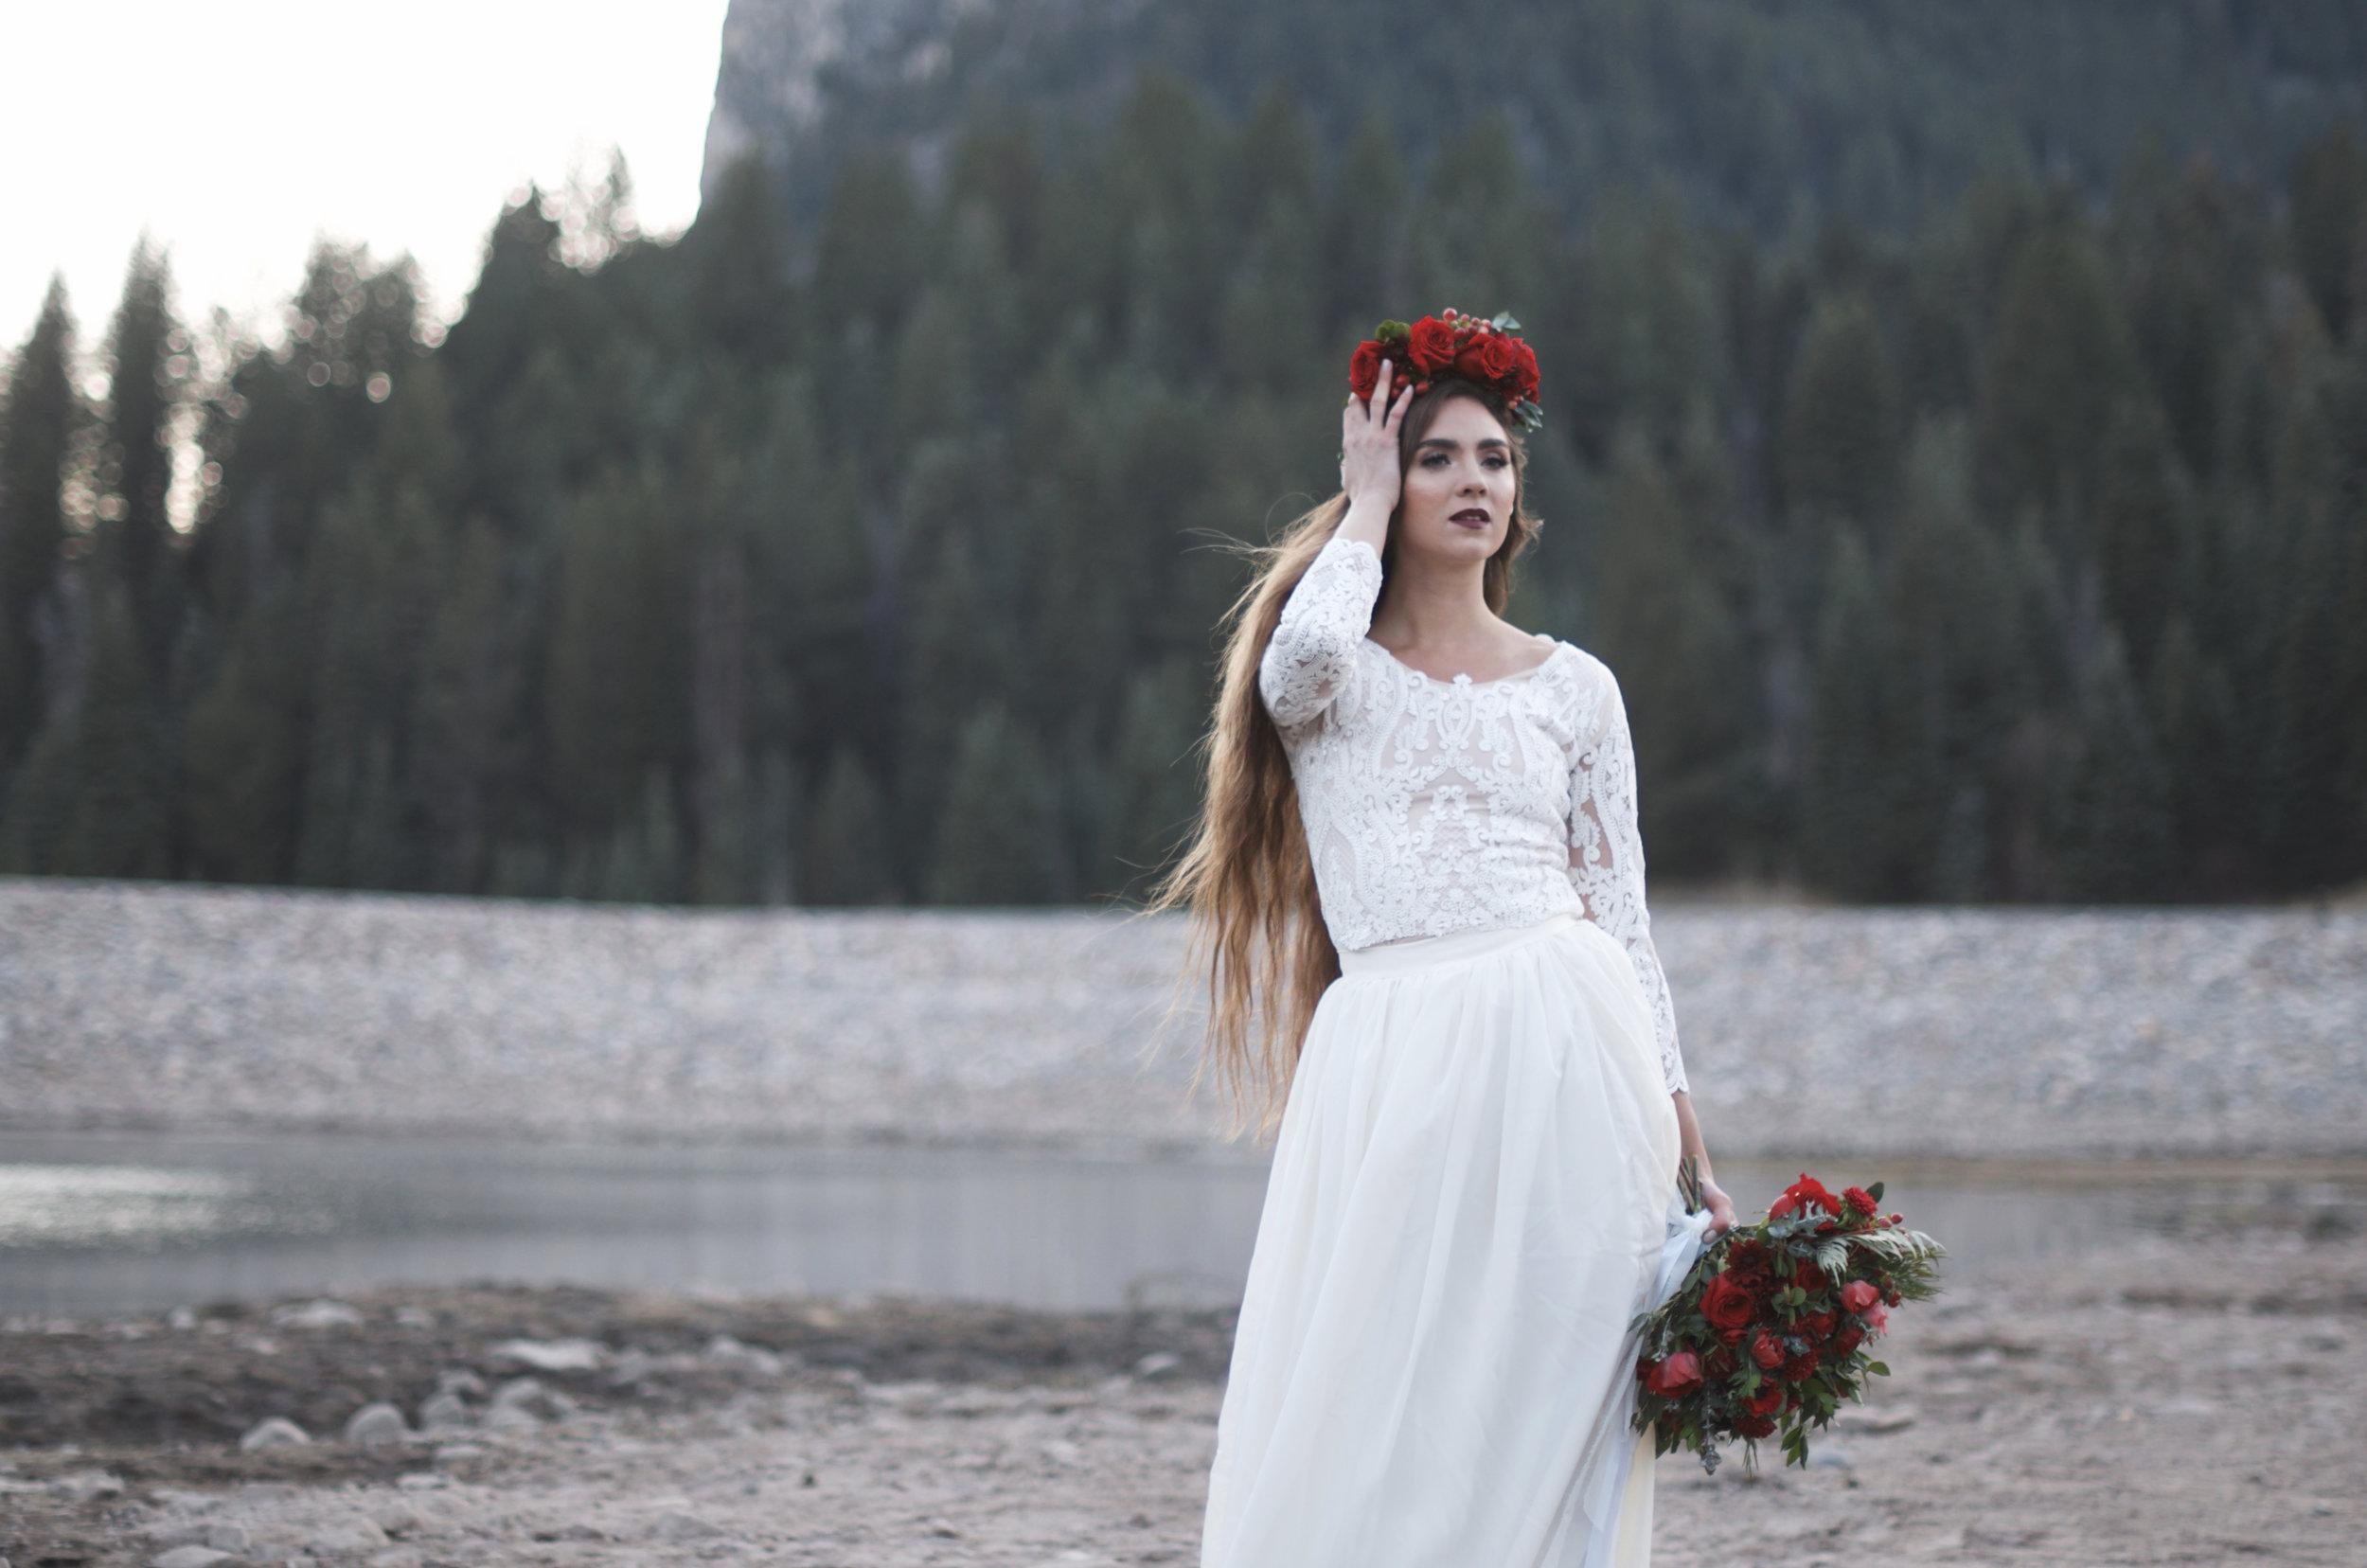 bridal hair and makeup artist in utah county.jpg